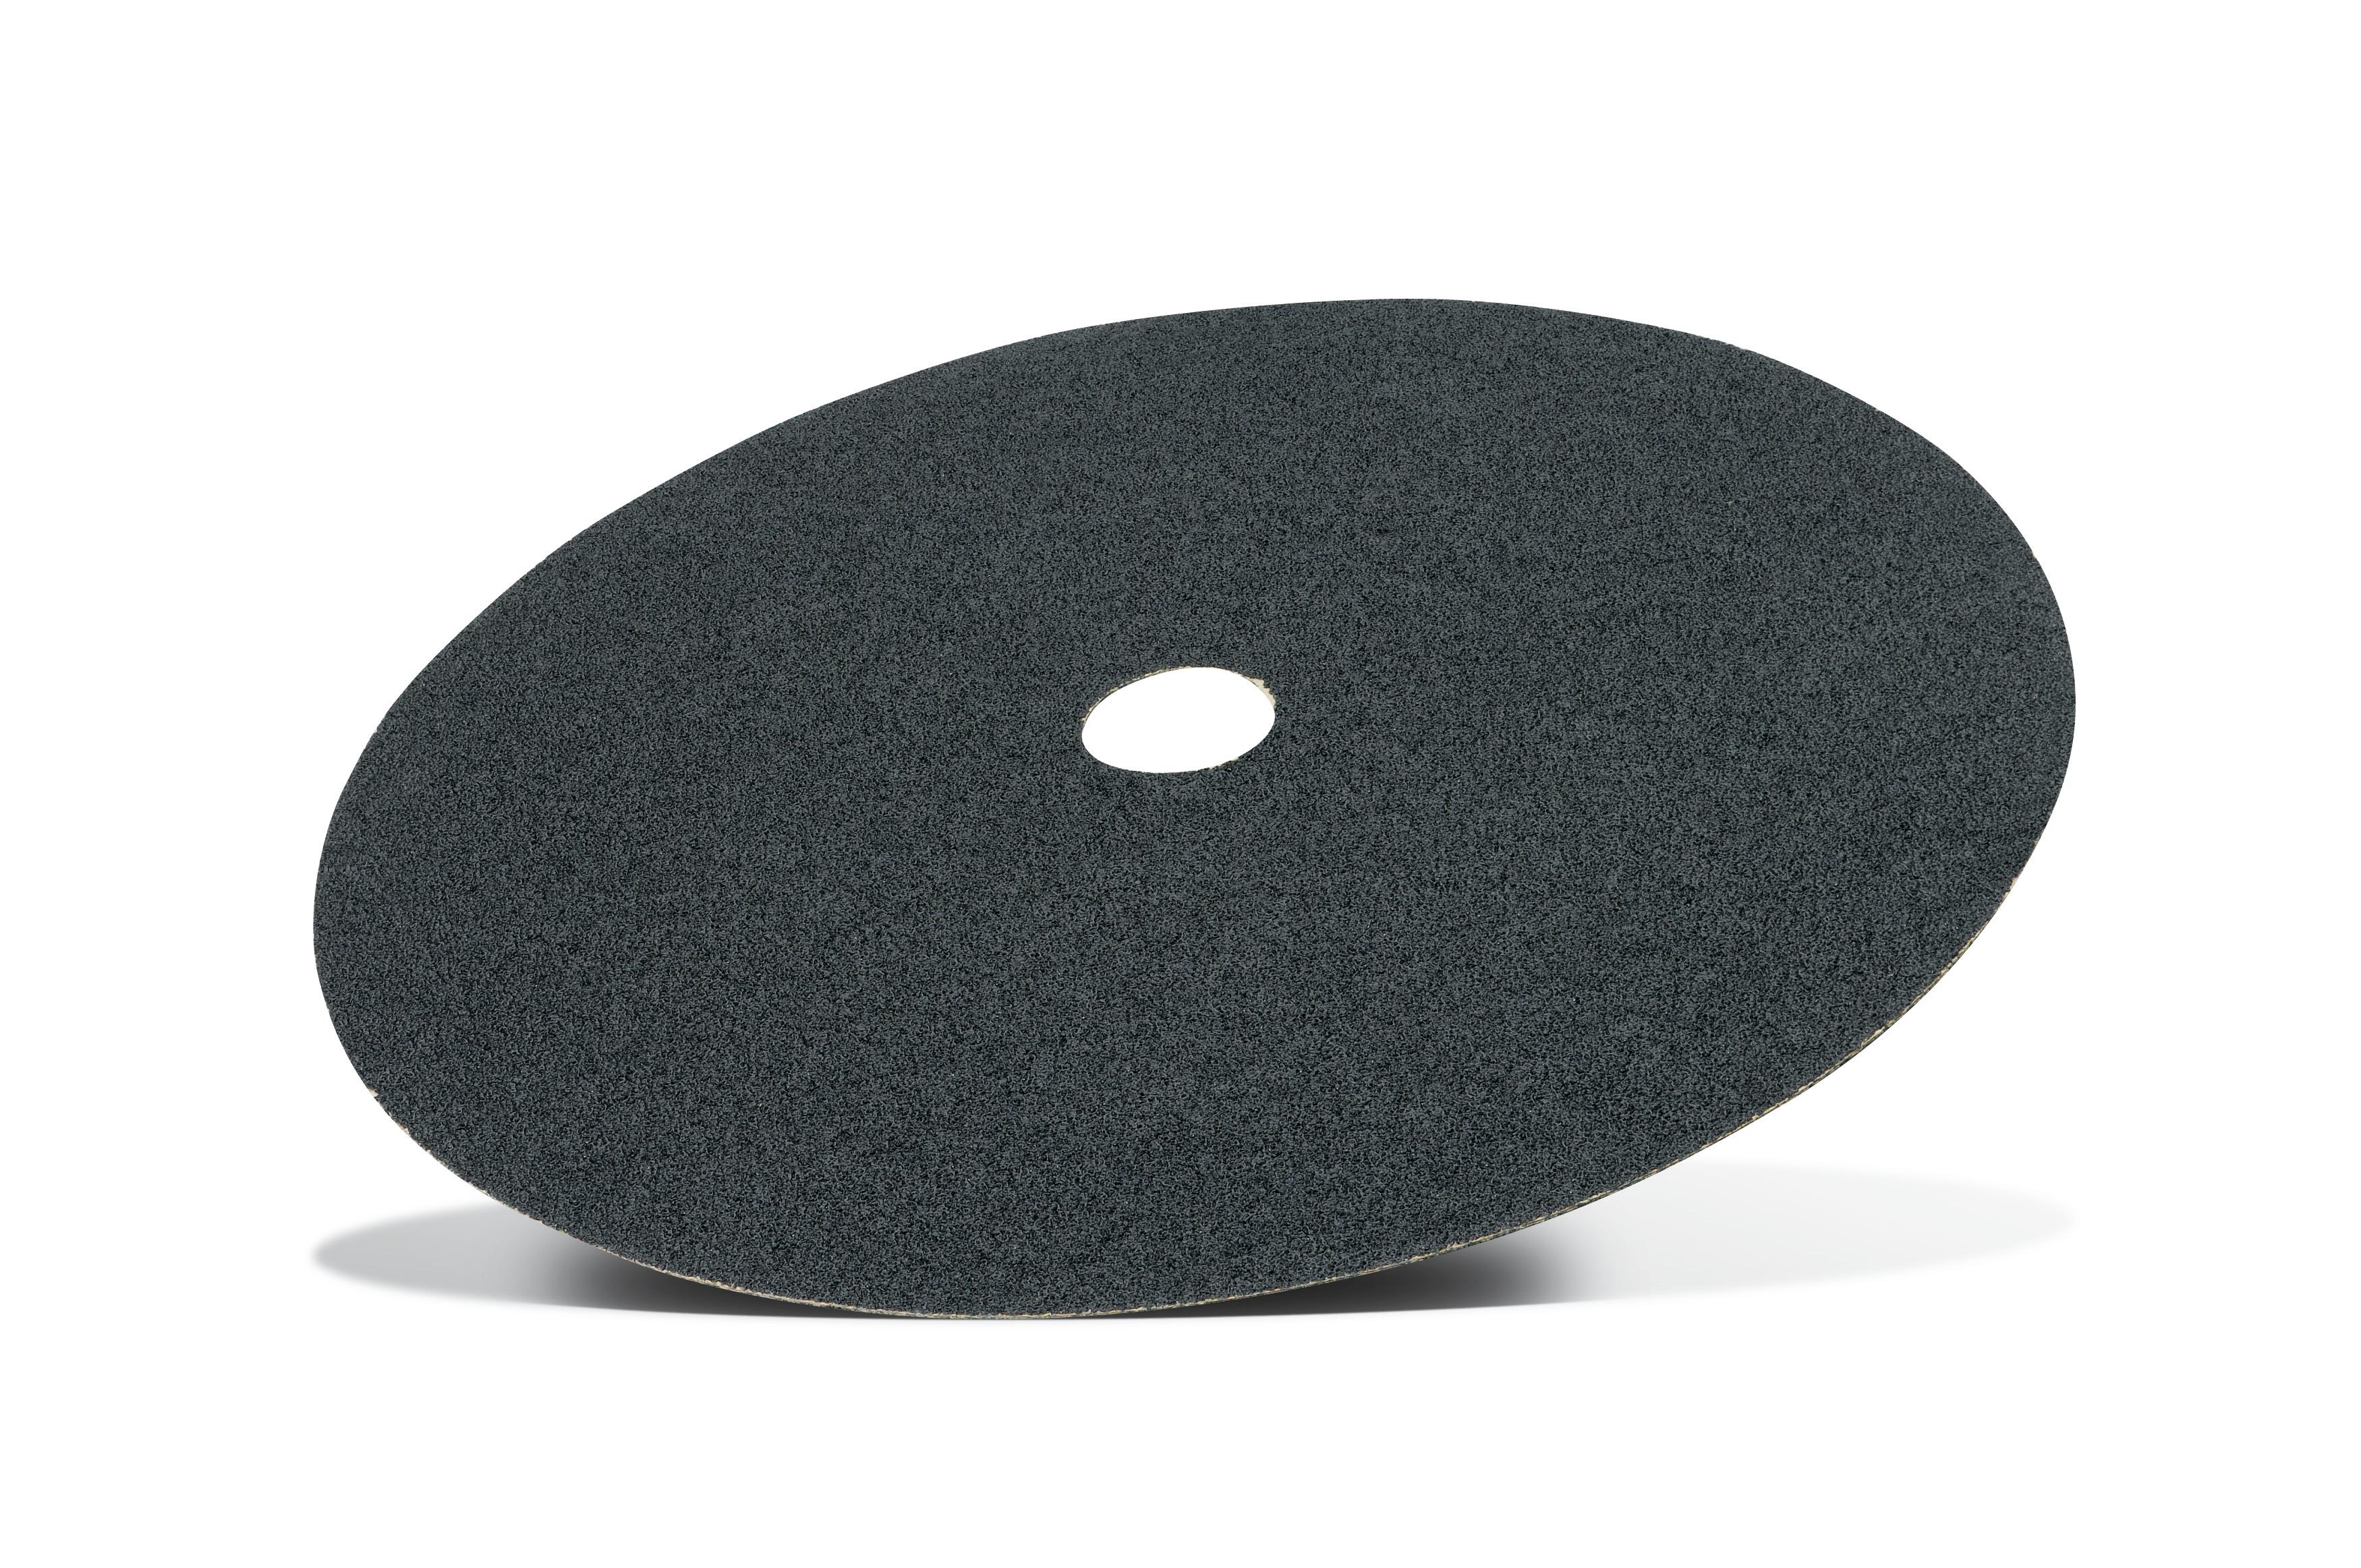 Abrasive paper disc, 375 mm dia. Pajarito